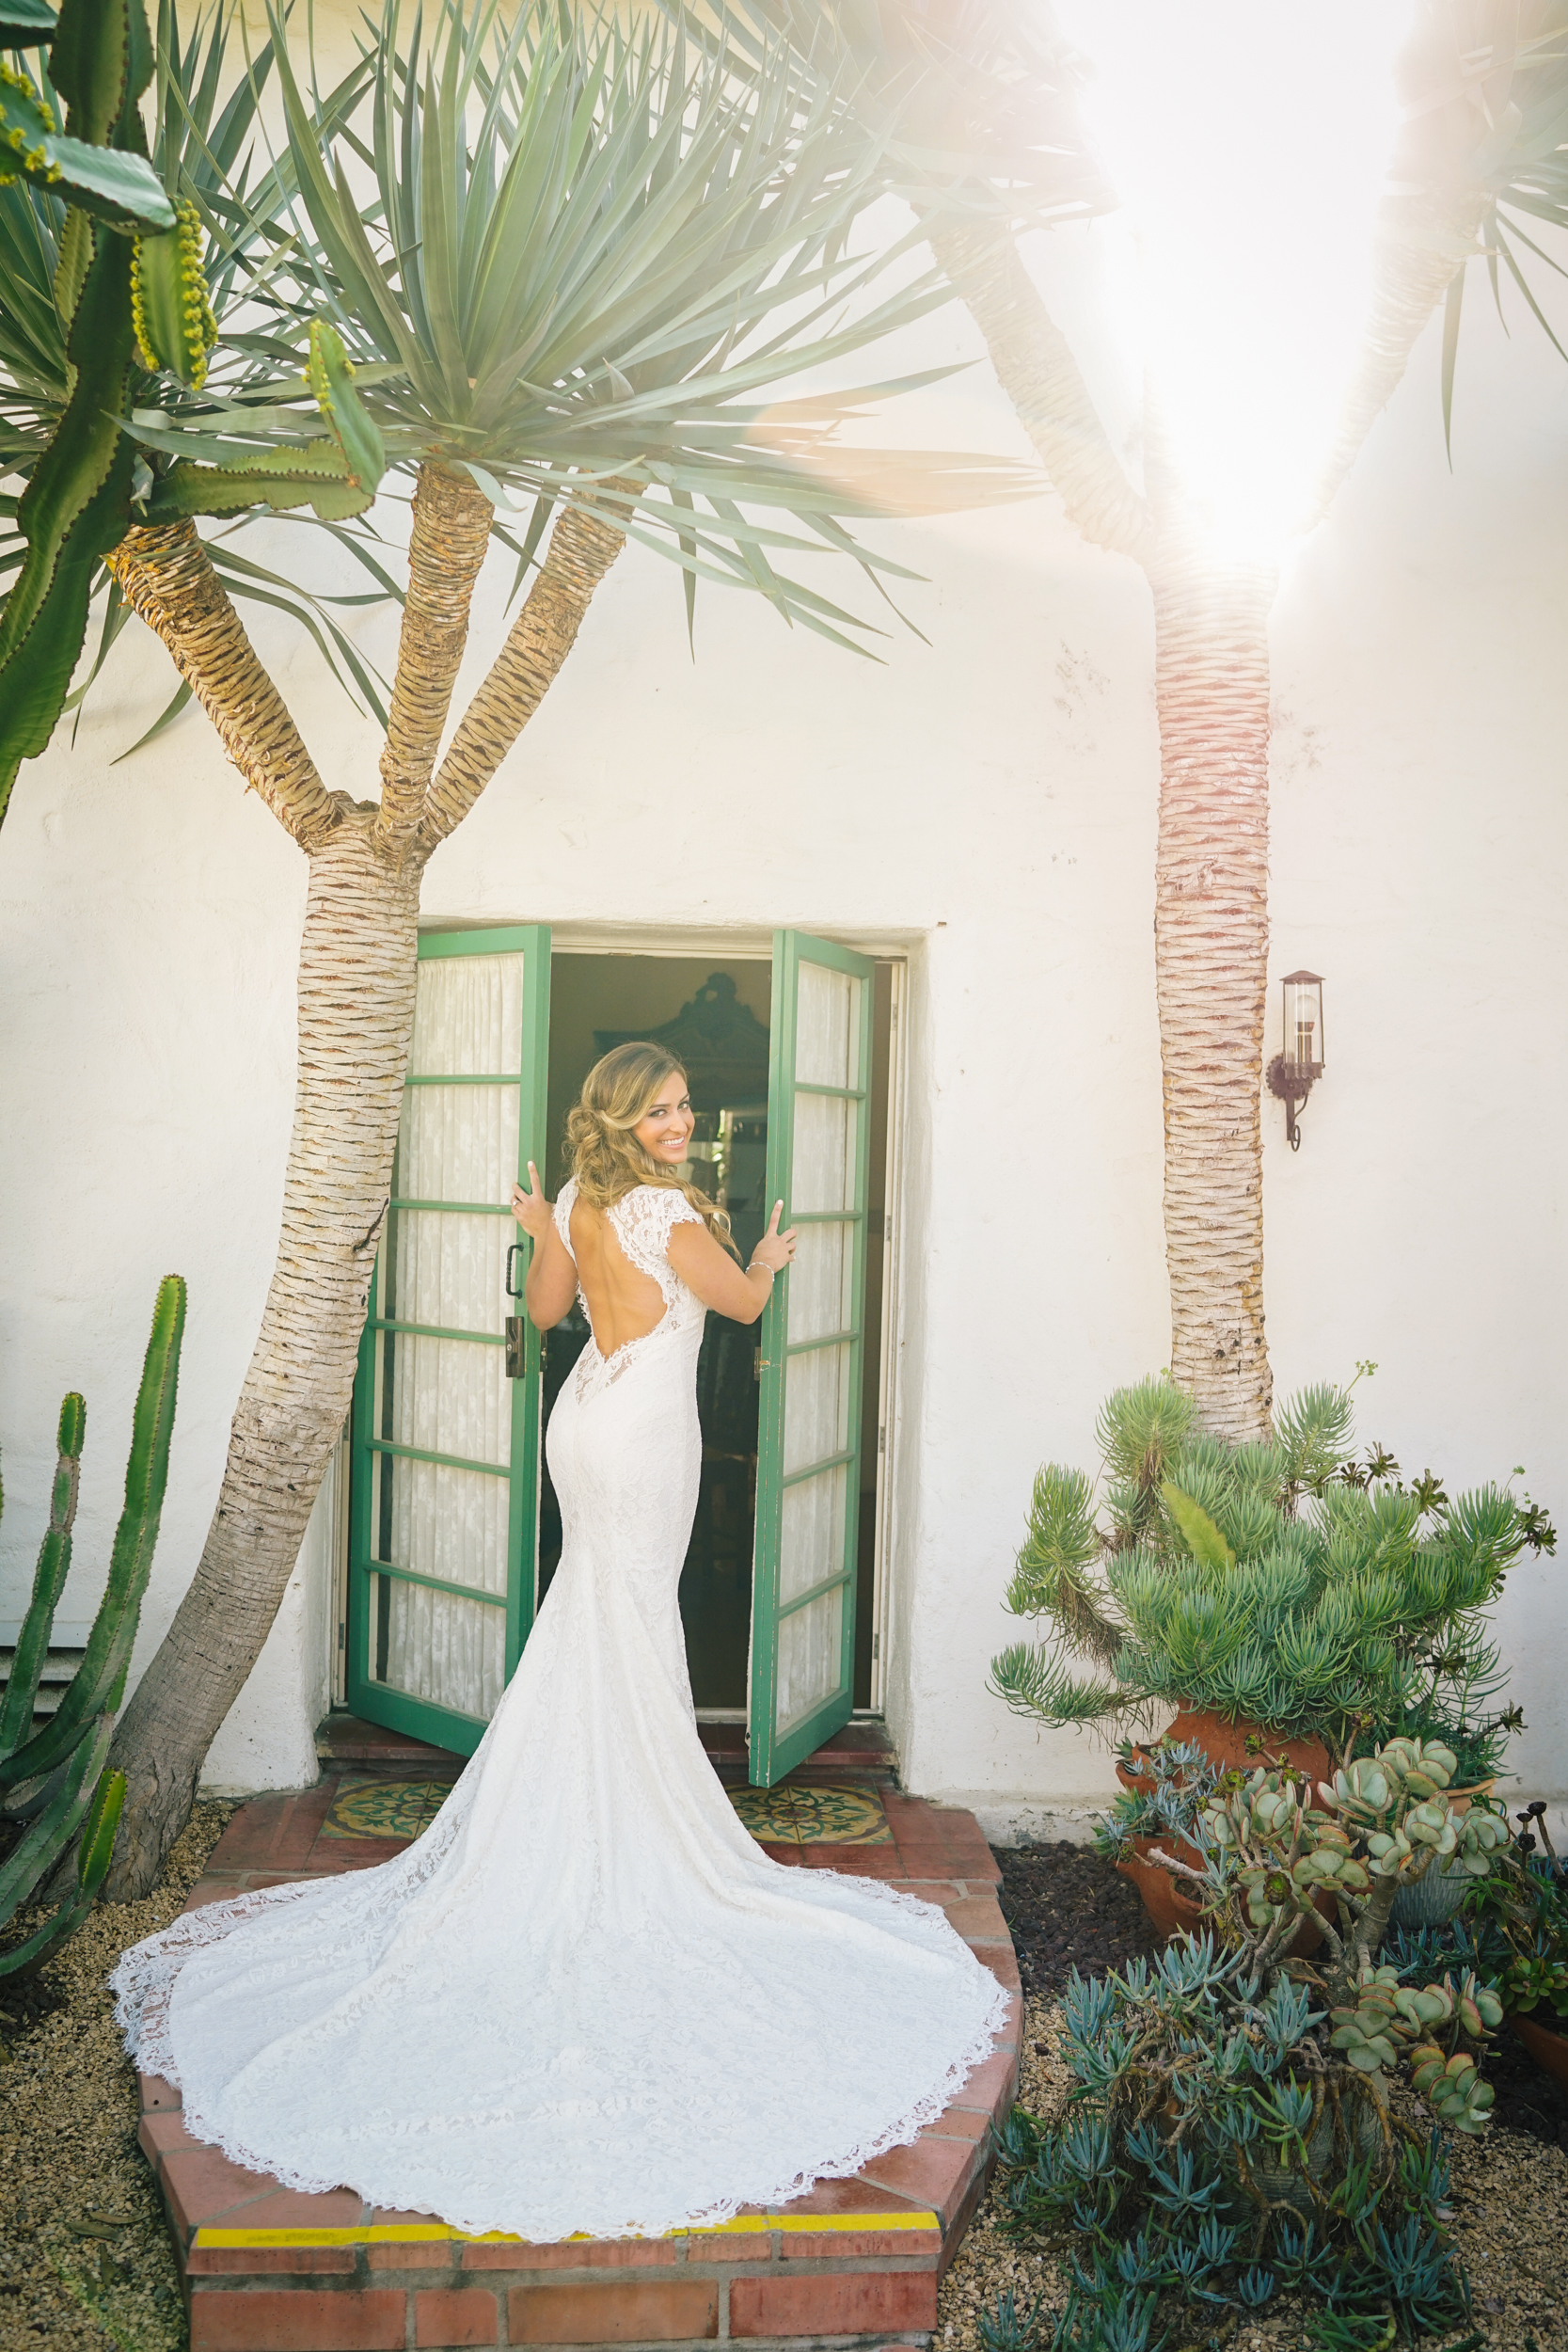 Casa-Romantica-Wedding-0107.JPG